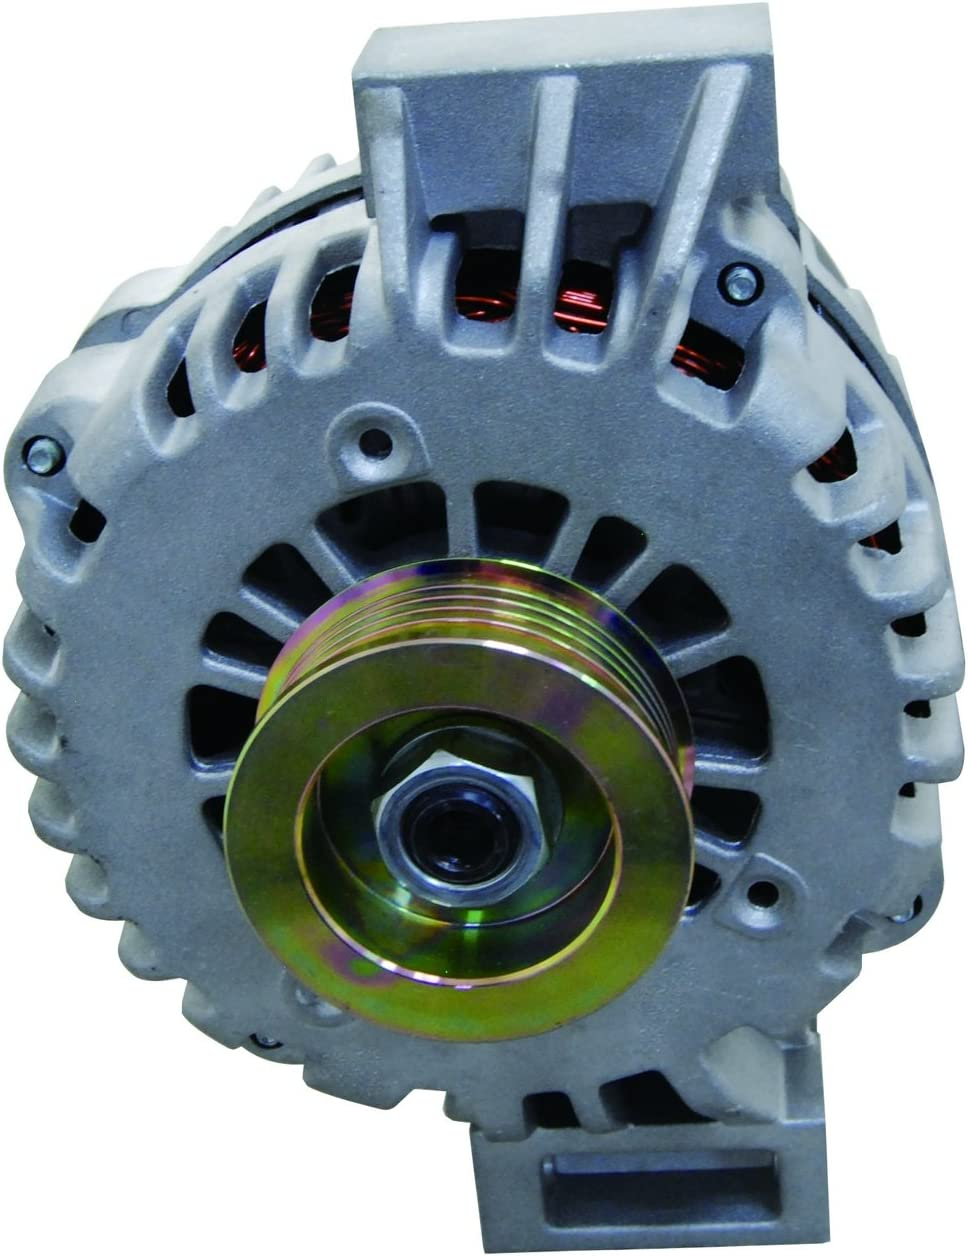 Premier Gear PG-8497 Professional Grade New Alternator